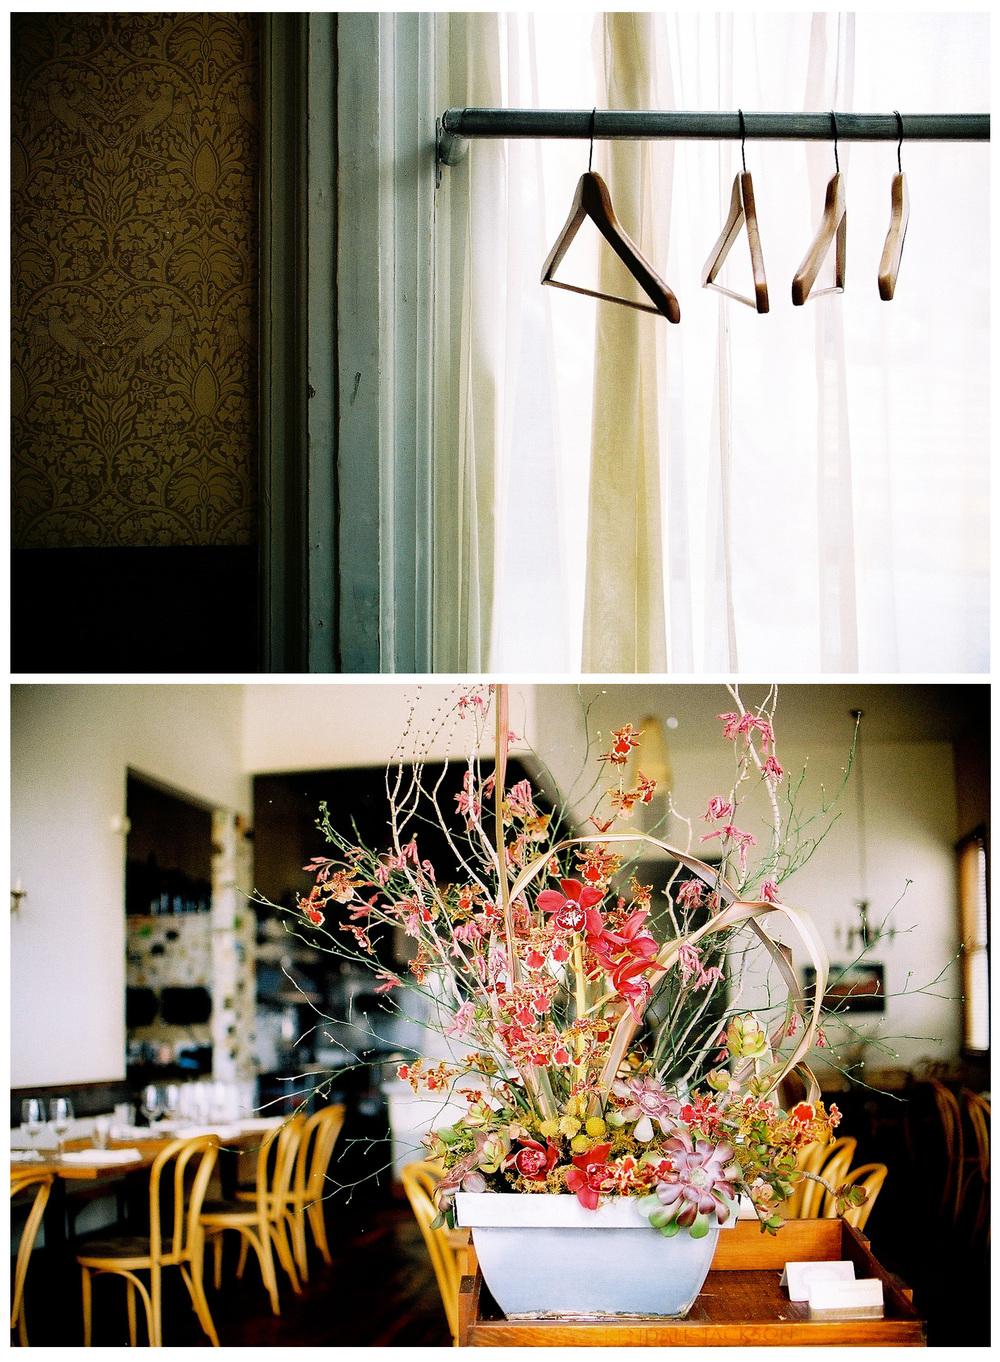 hangers and flowers.jpg